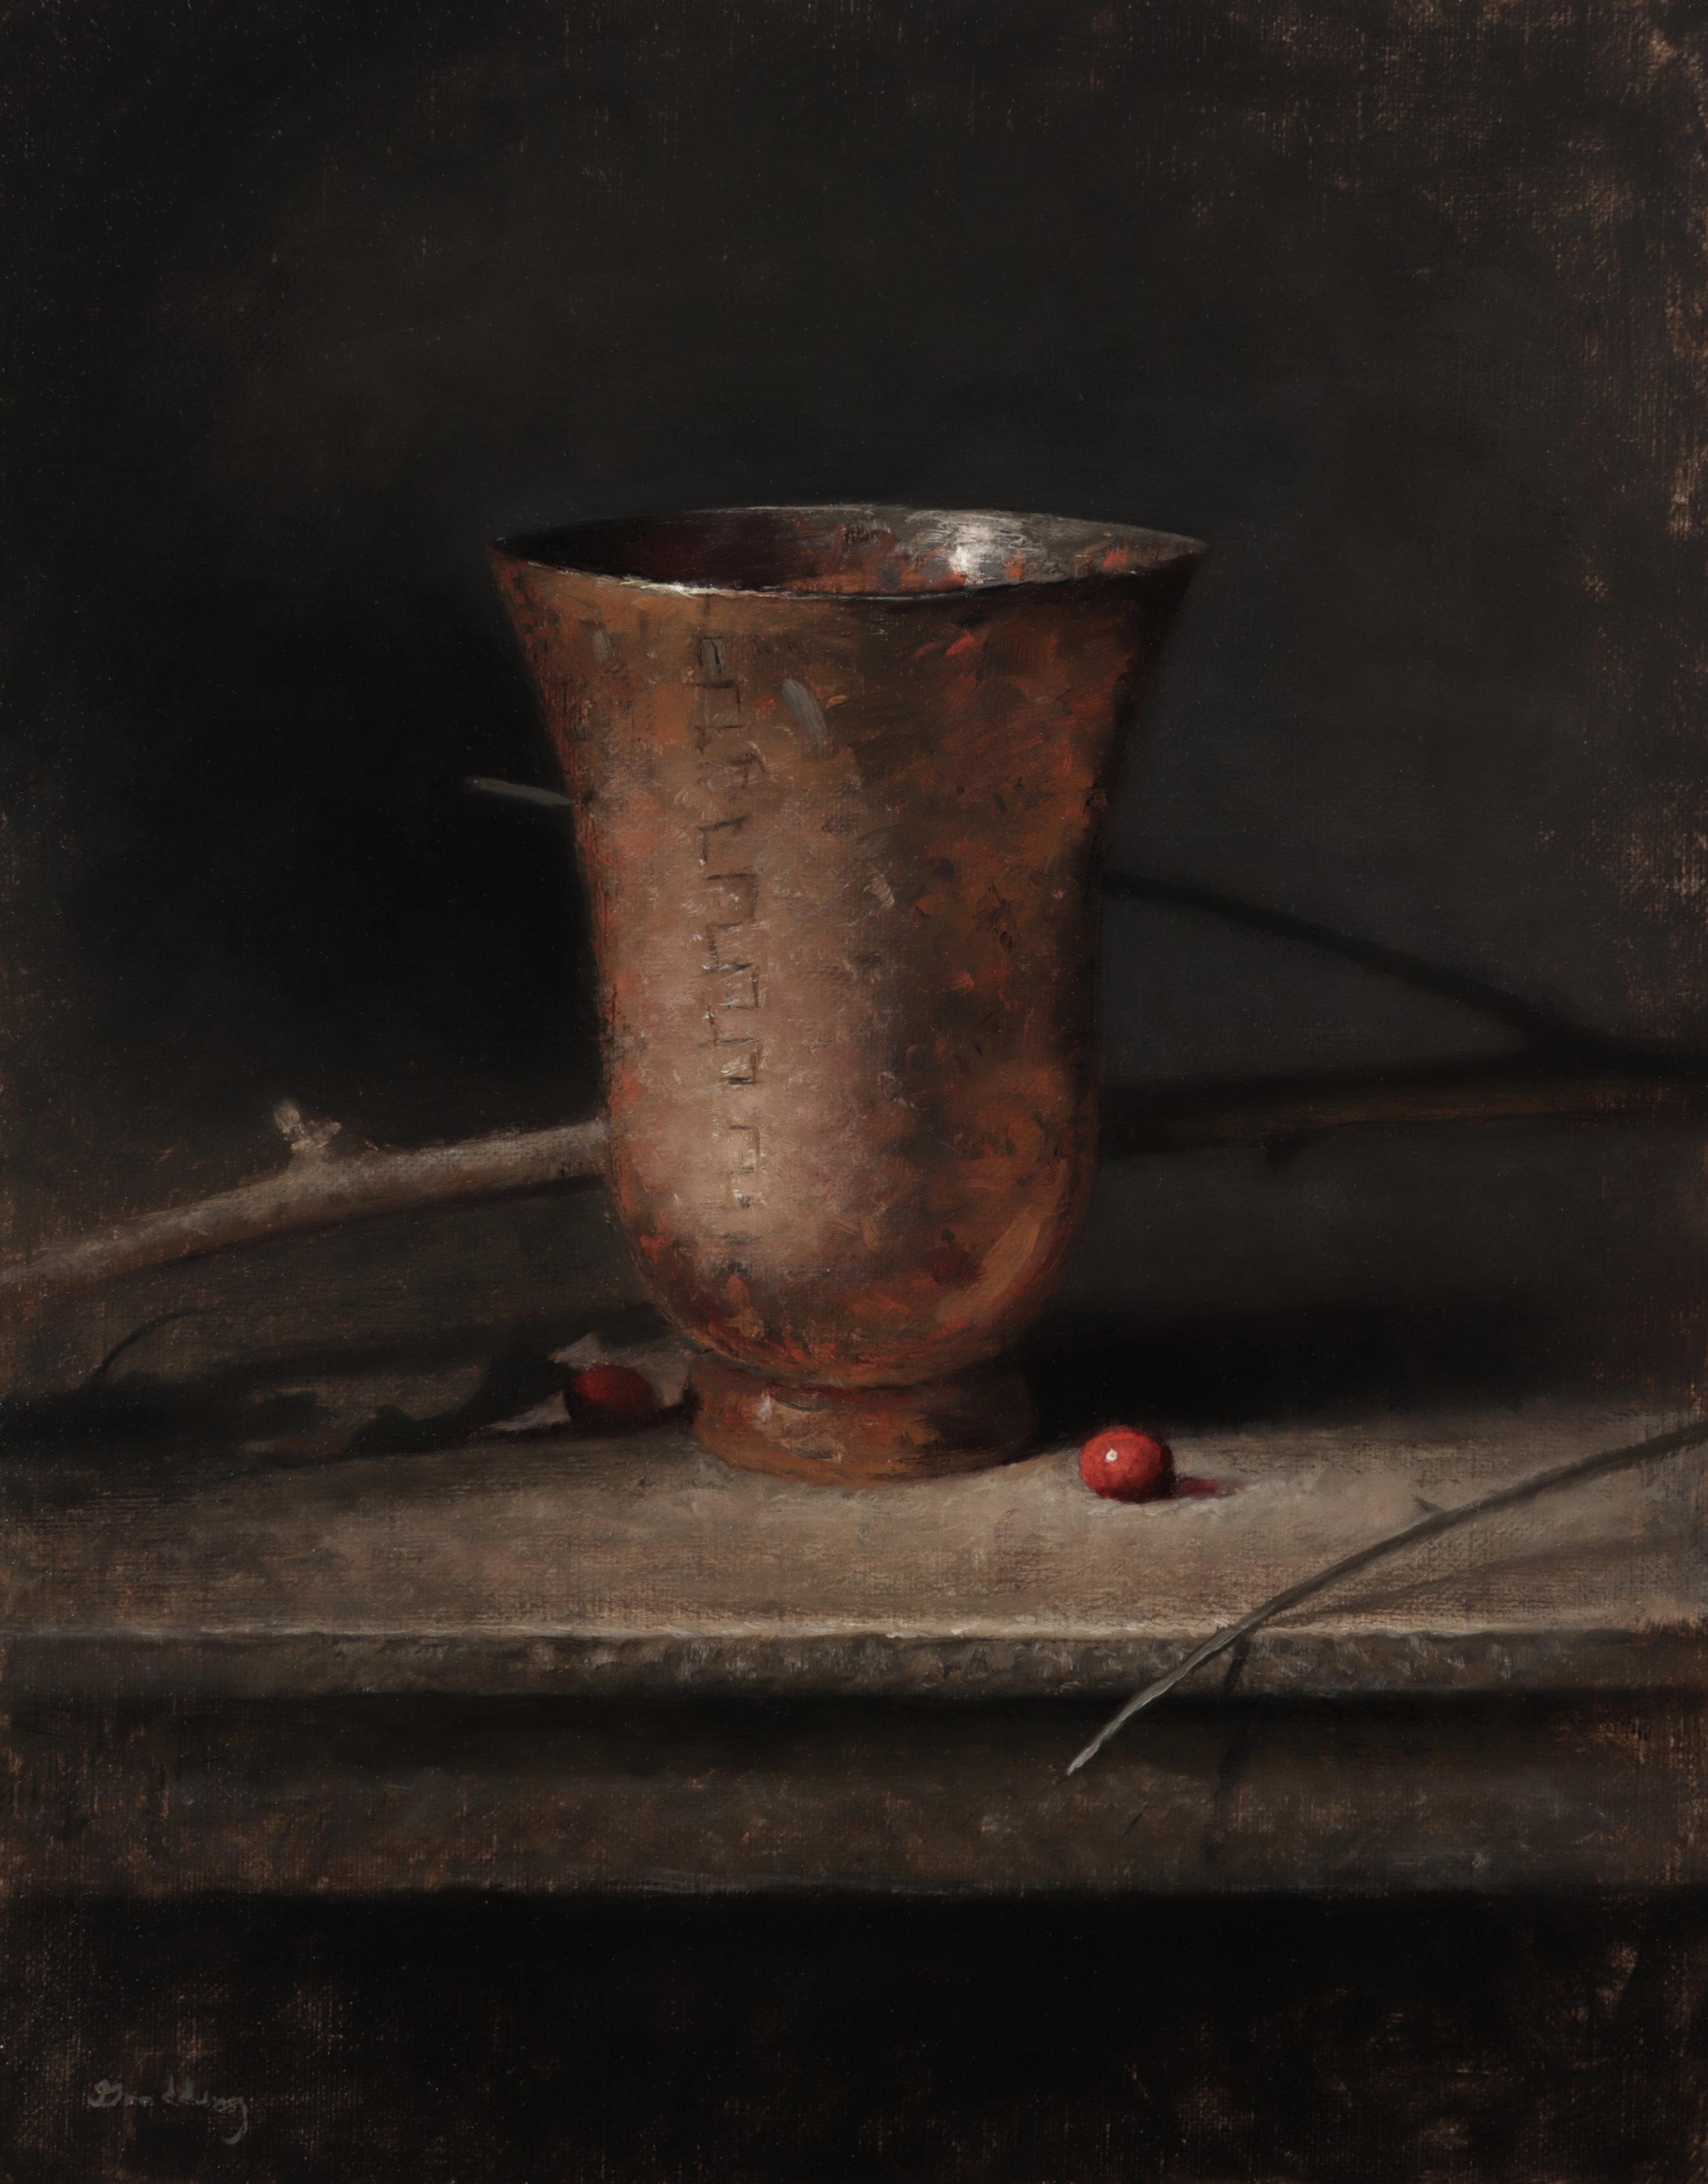 Jeremy Goodding -  Copper and Cranberries,  2018  Lincoln, NE